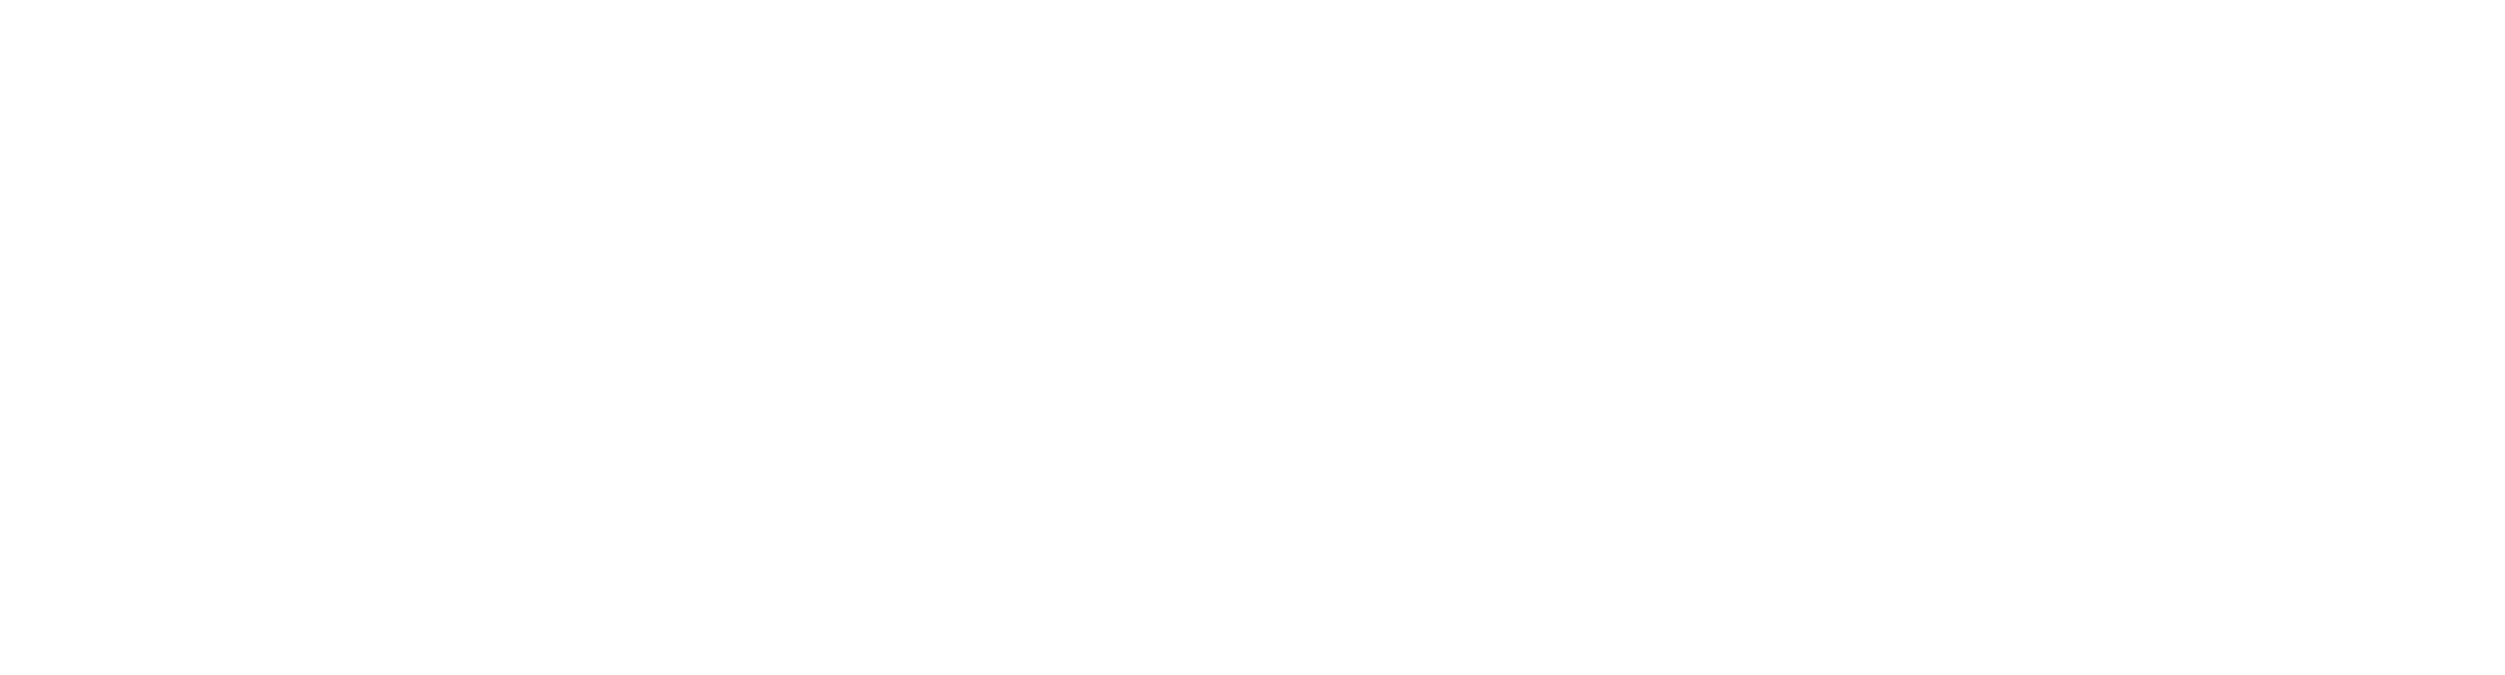 logo-weinbaumuseum-negativ